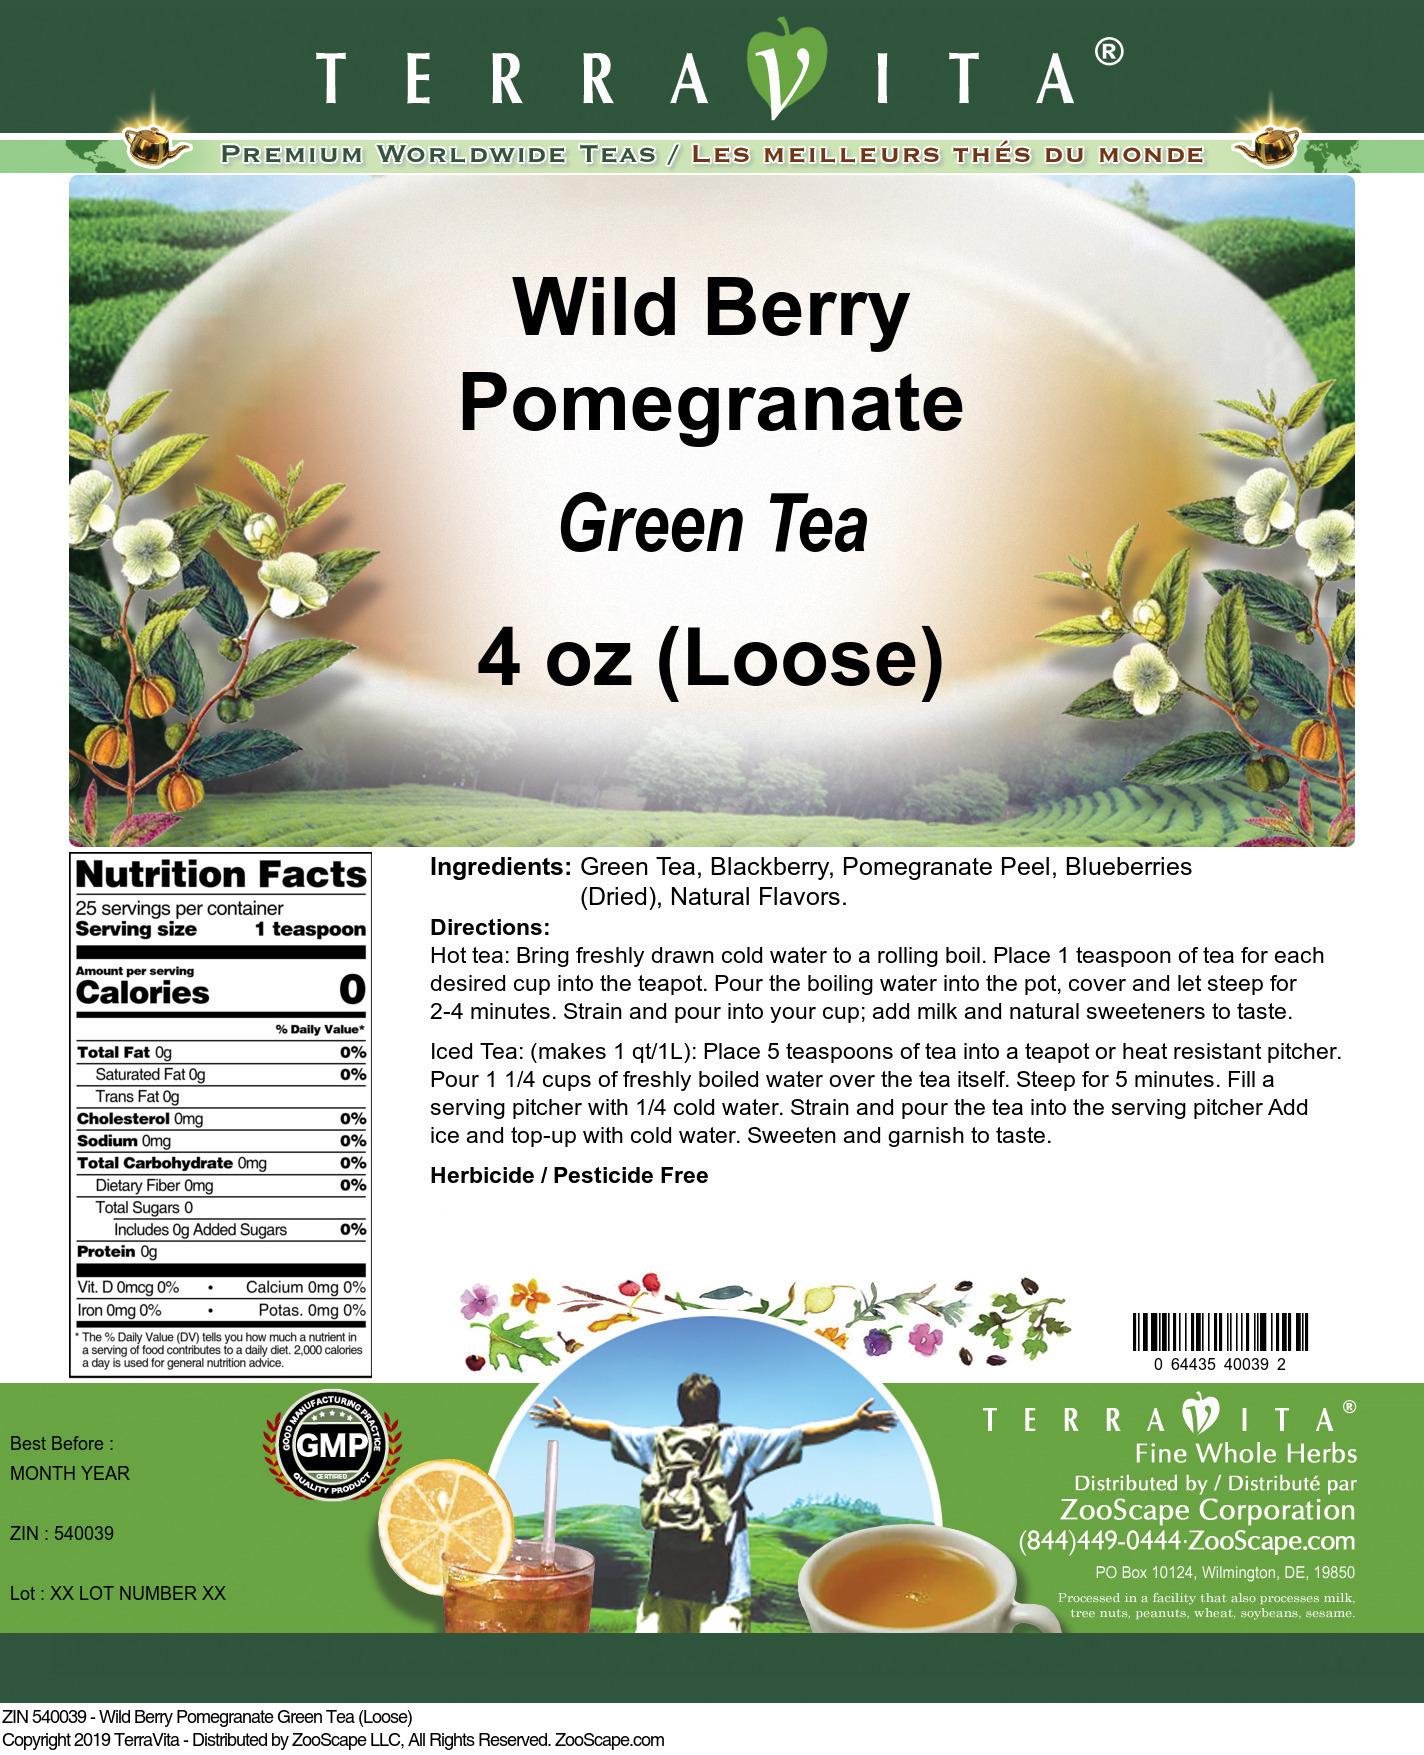 Wild Berry Pomegranate Green Tea